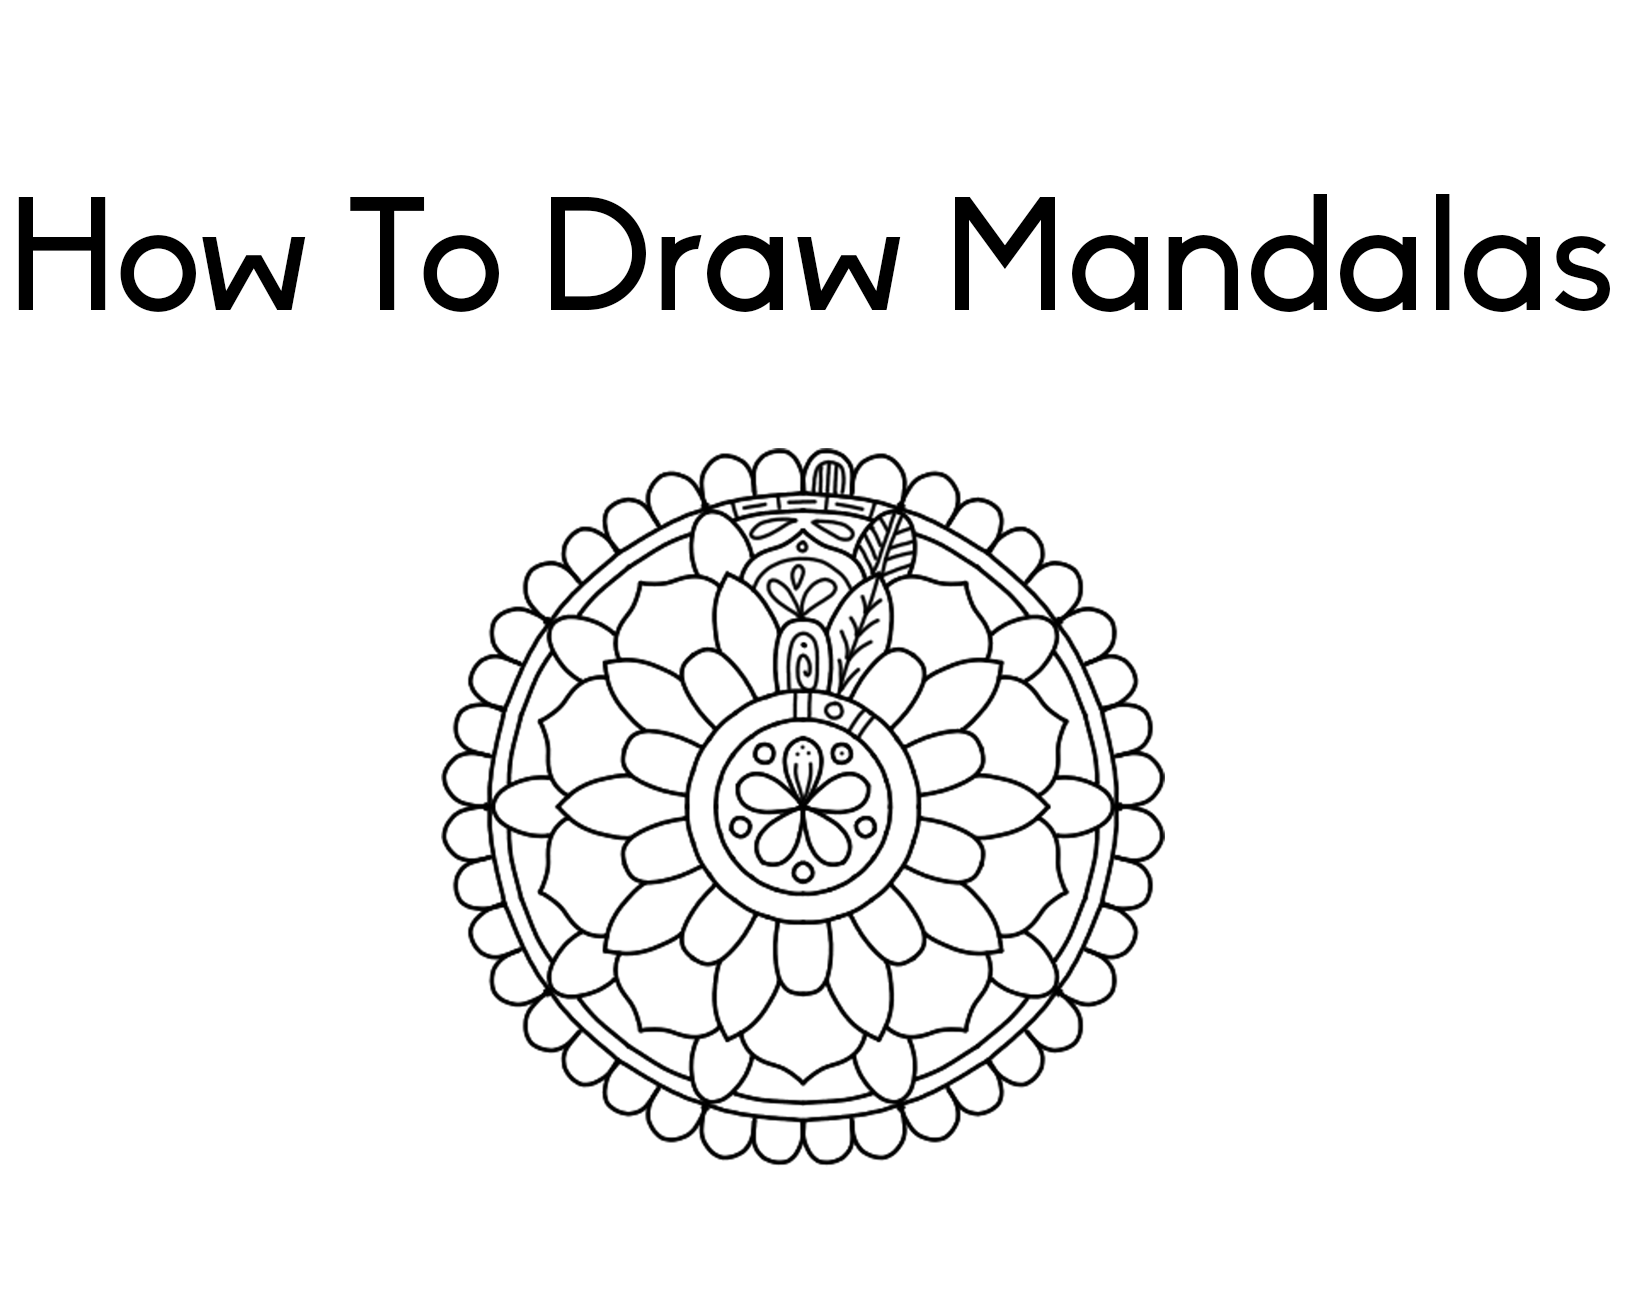 1636x1298 How To Draw Mandalas By Screwy Lightbulb